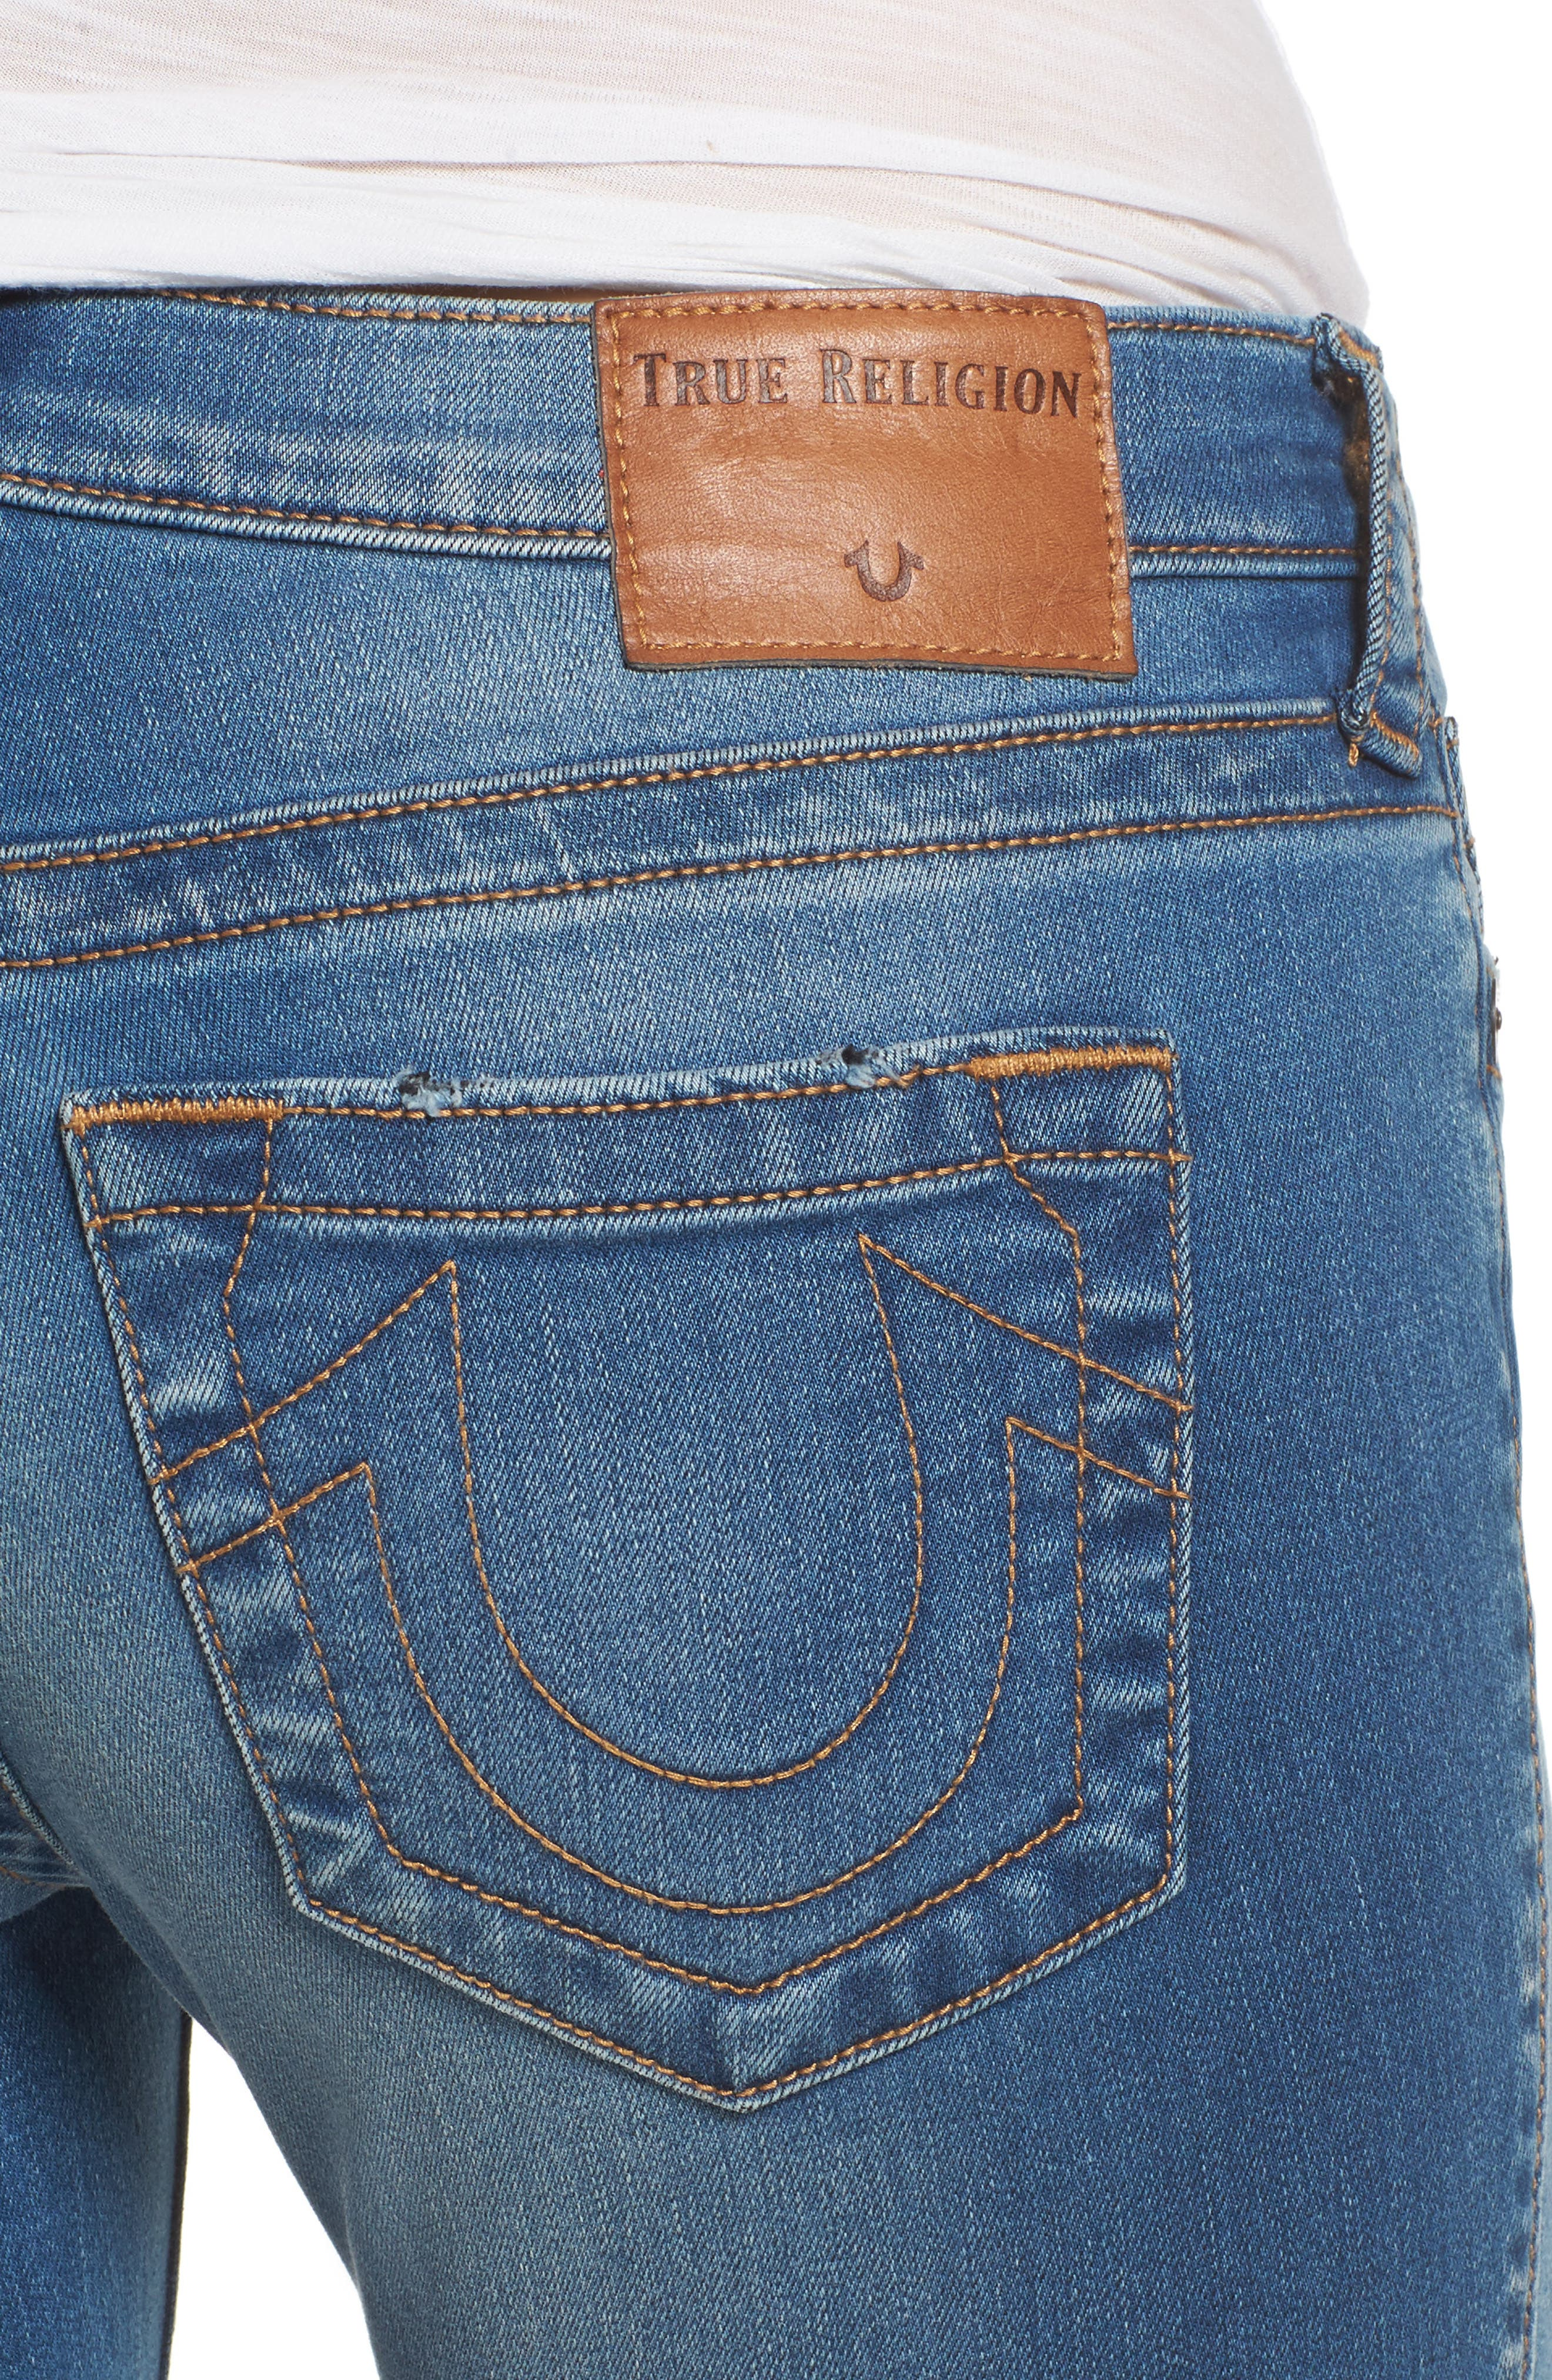 Stella Low Rise Skinny Jeans,                             Alternate thumbnail 4, color,                             400